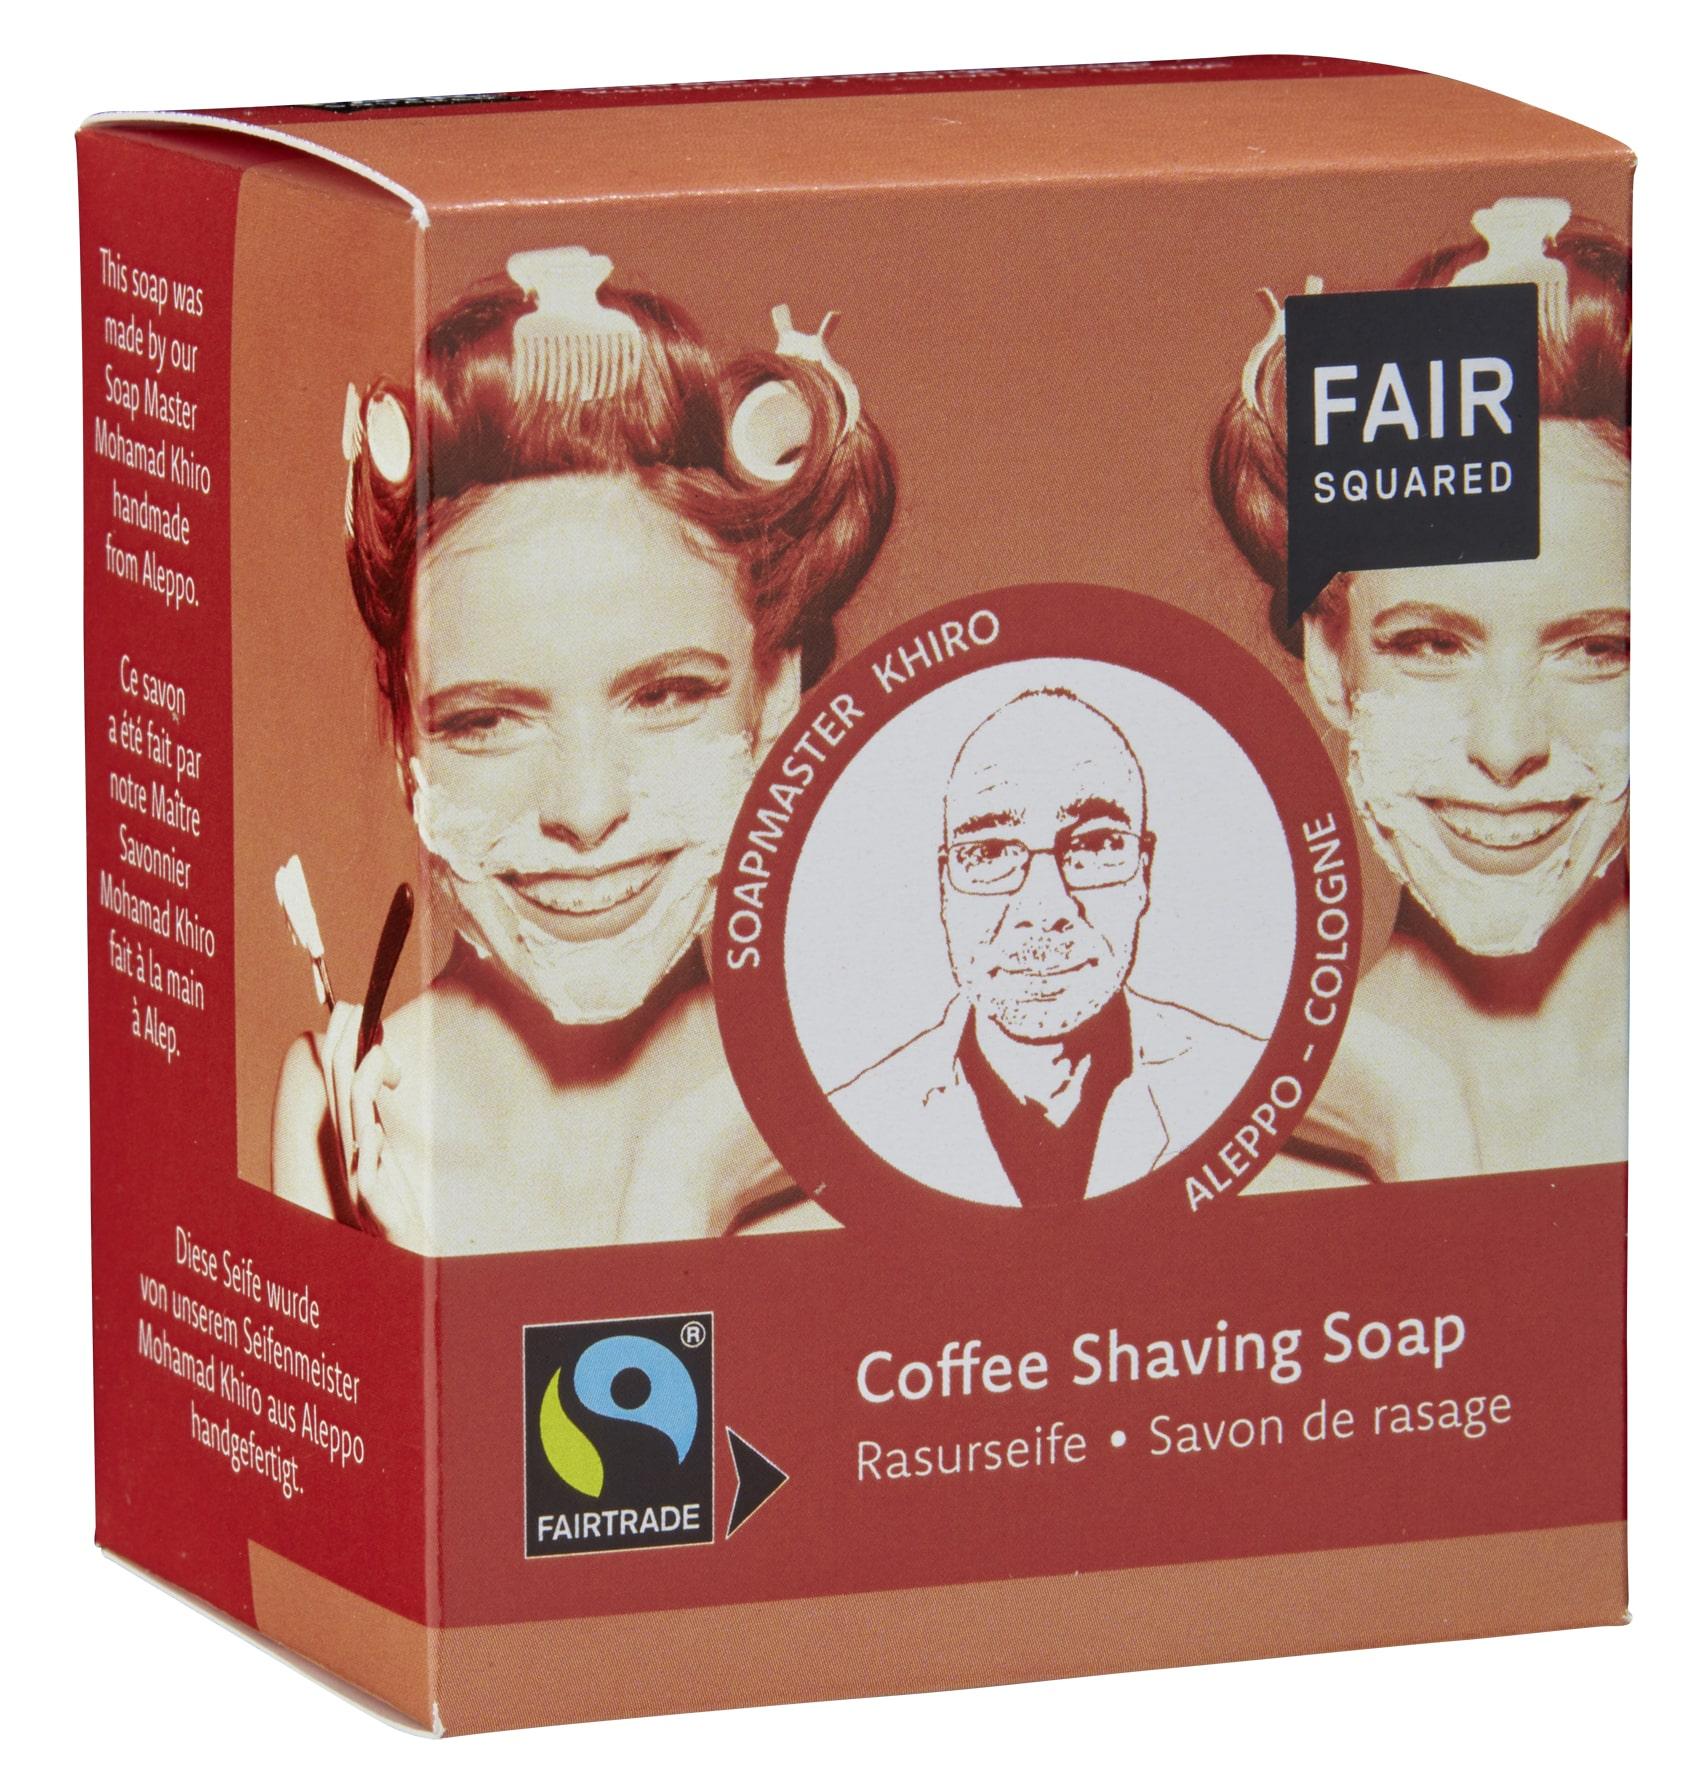 Coffee Shaving Soap